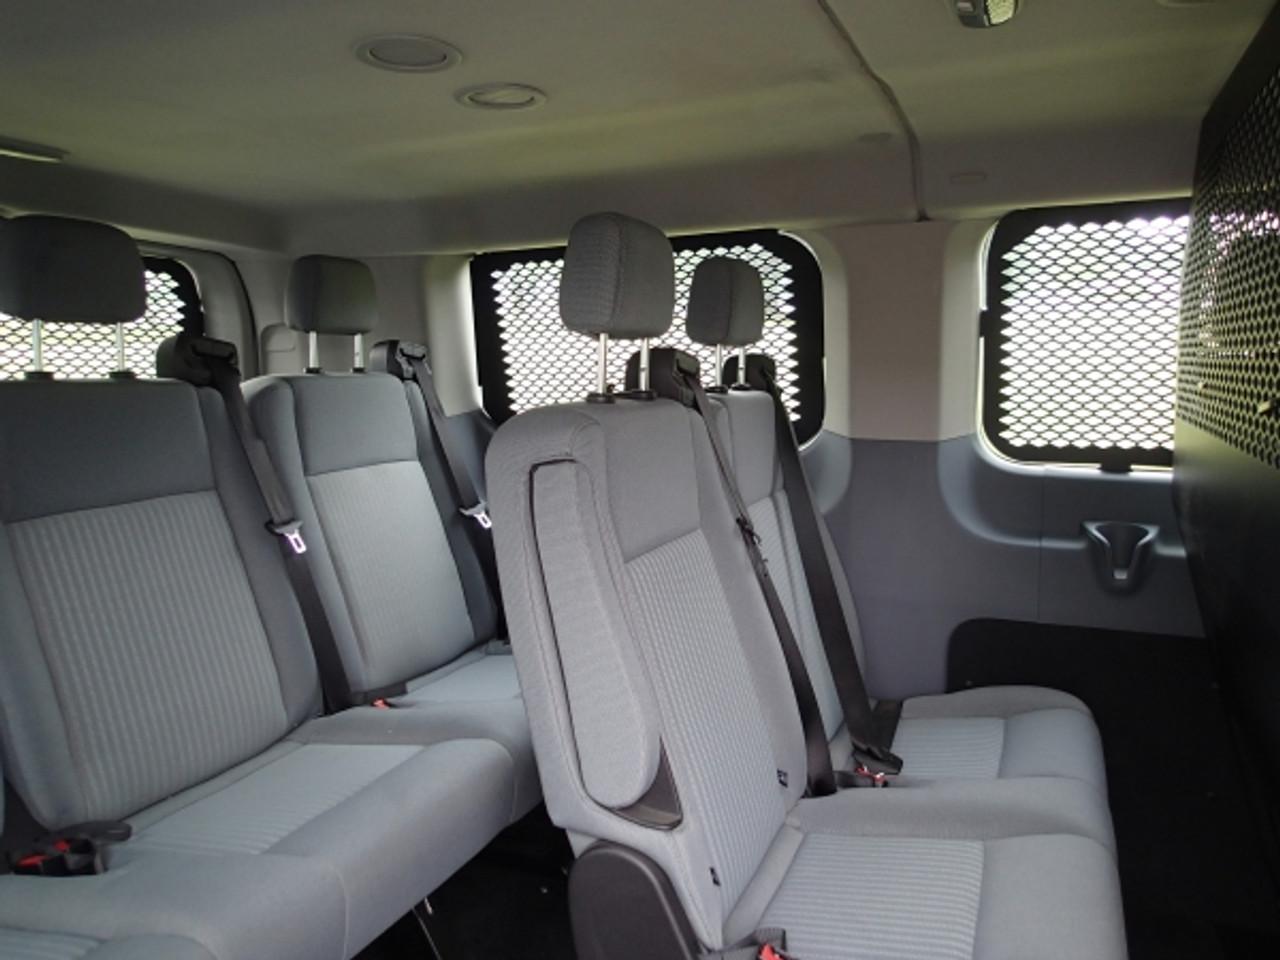 Havis Ford Transit Van 7 Window Guards Kit For 130 Inch